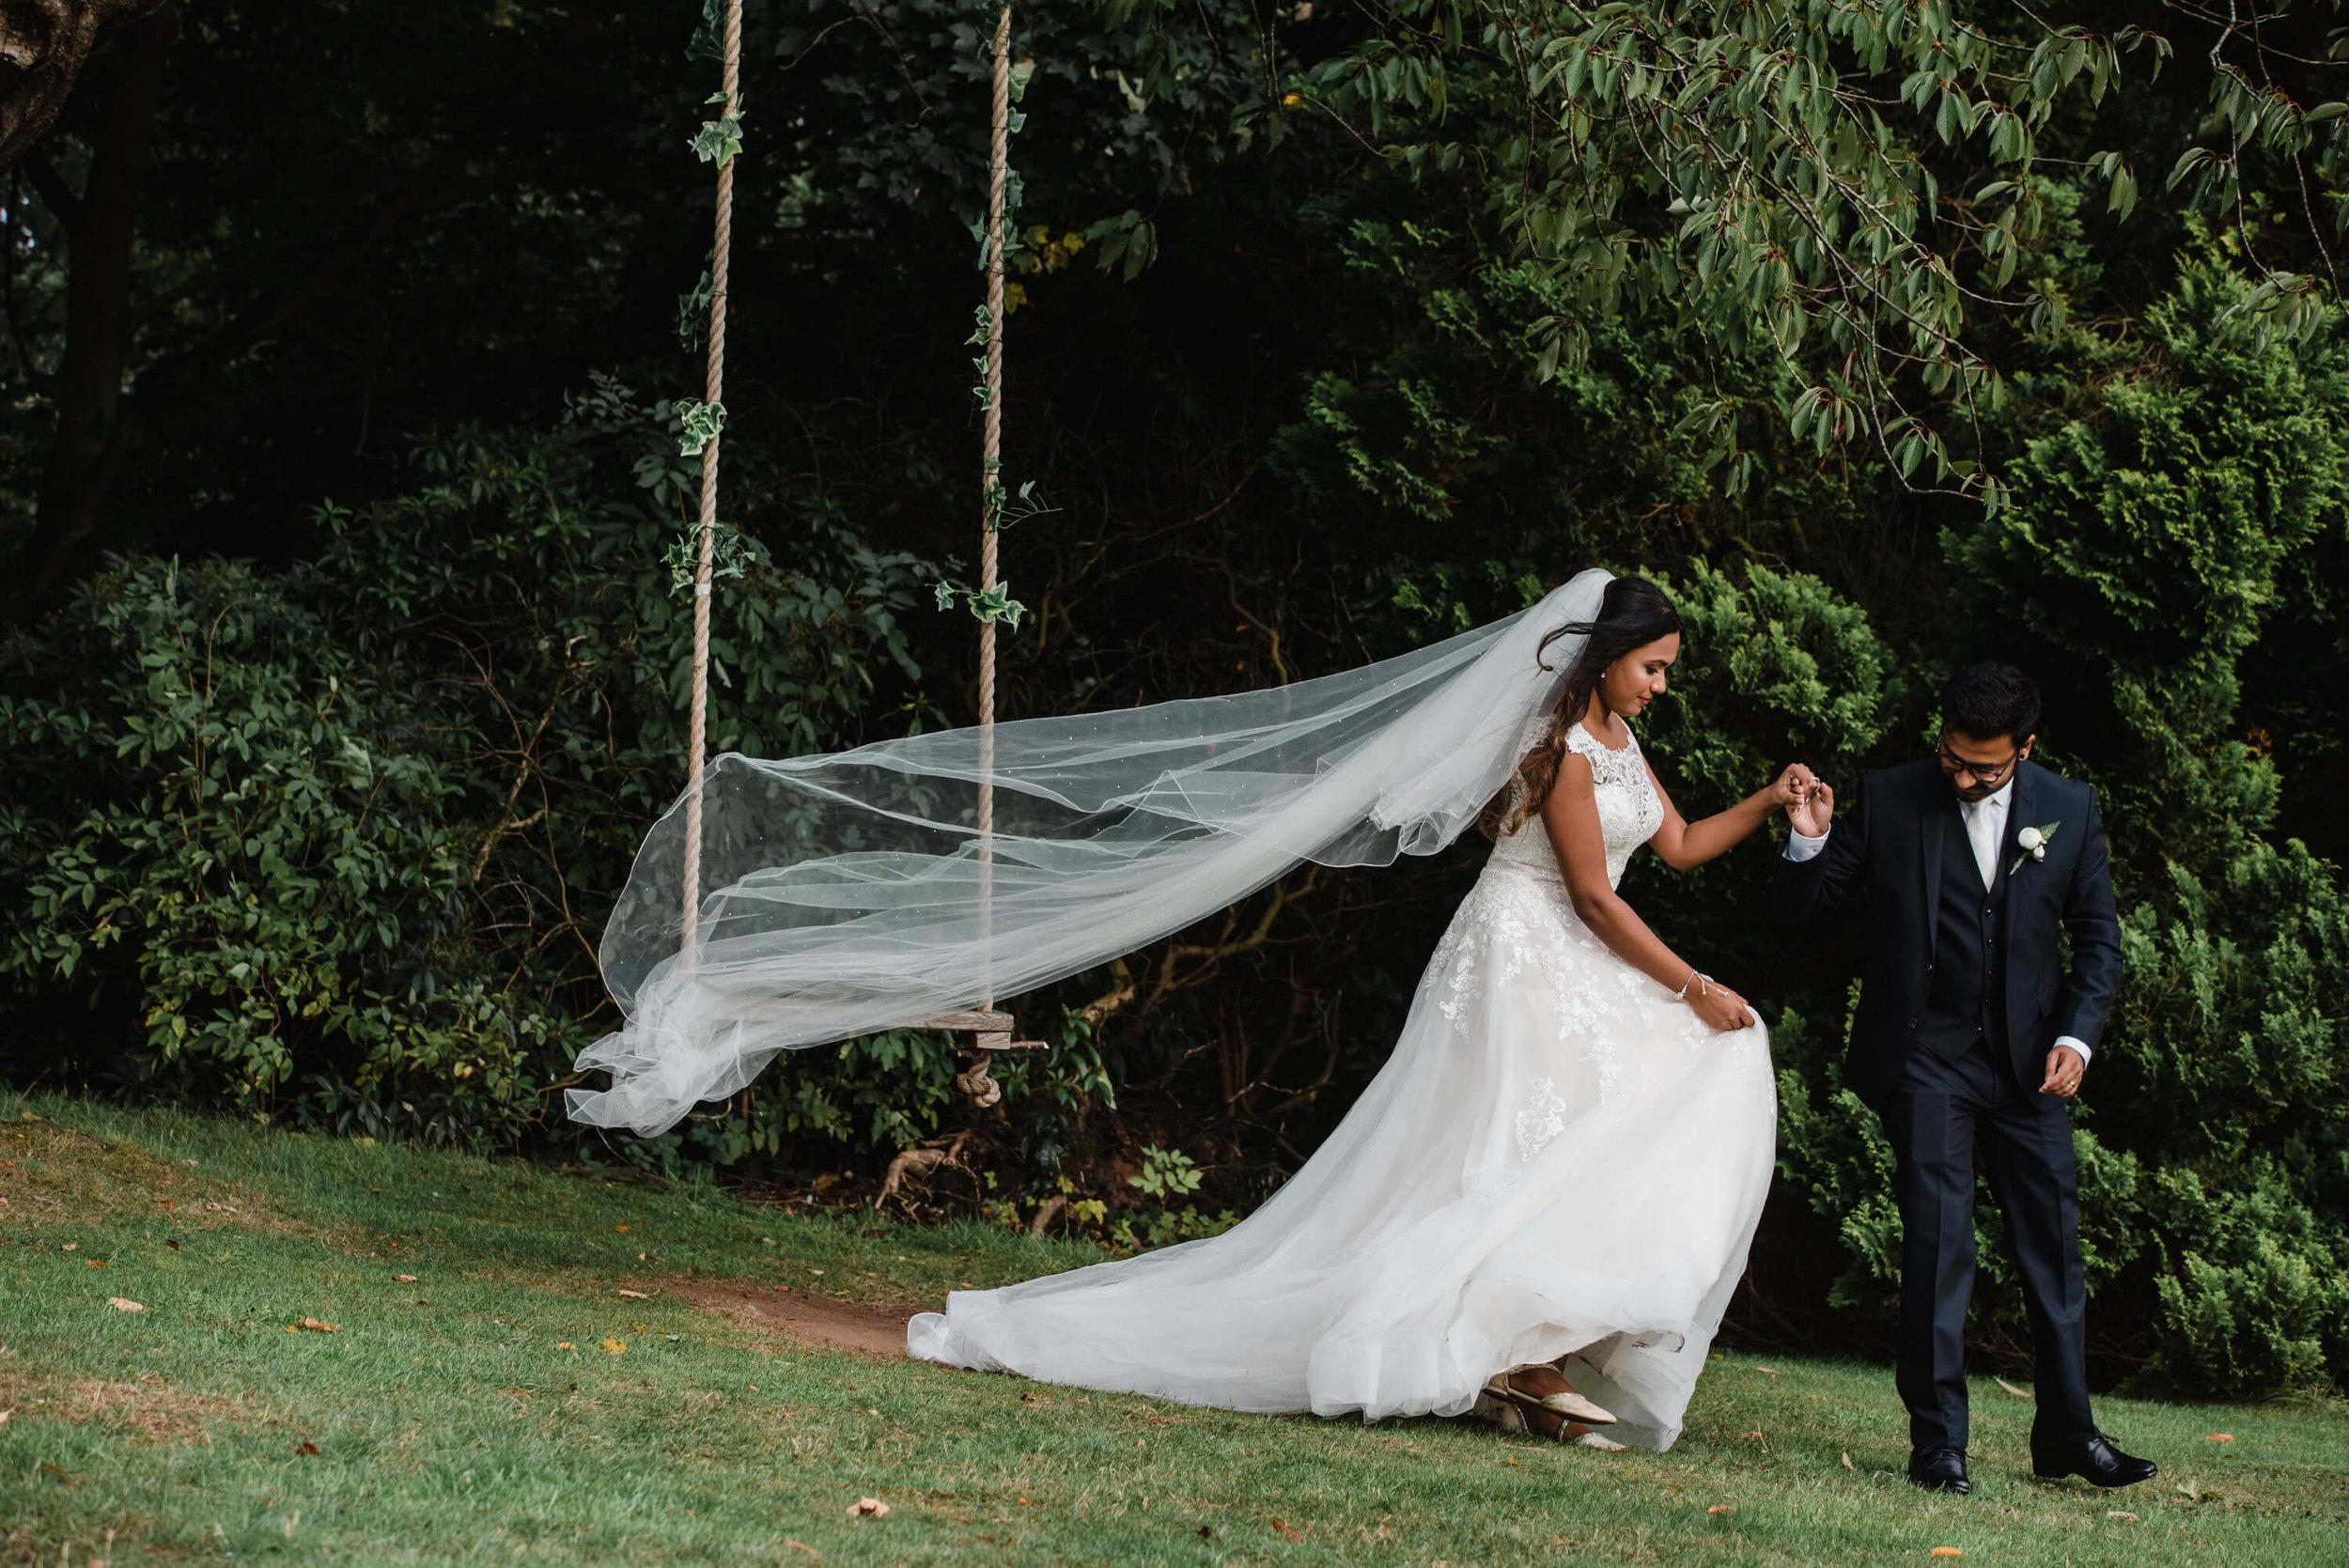 Manchester-Wedding-Photographer-011.jpg